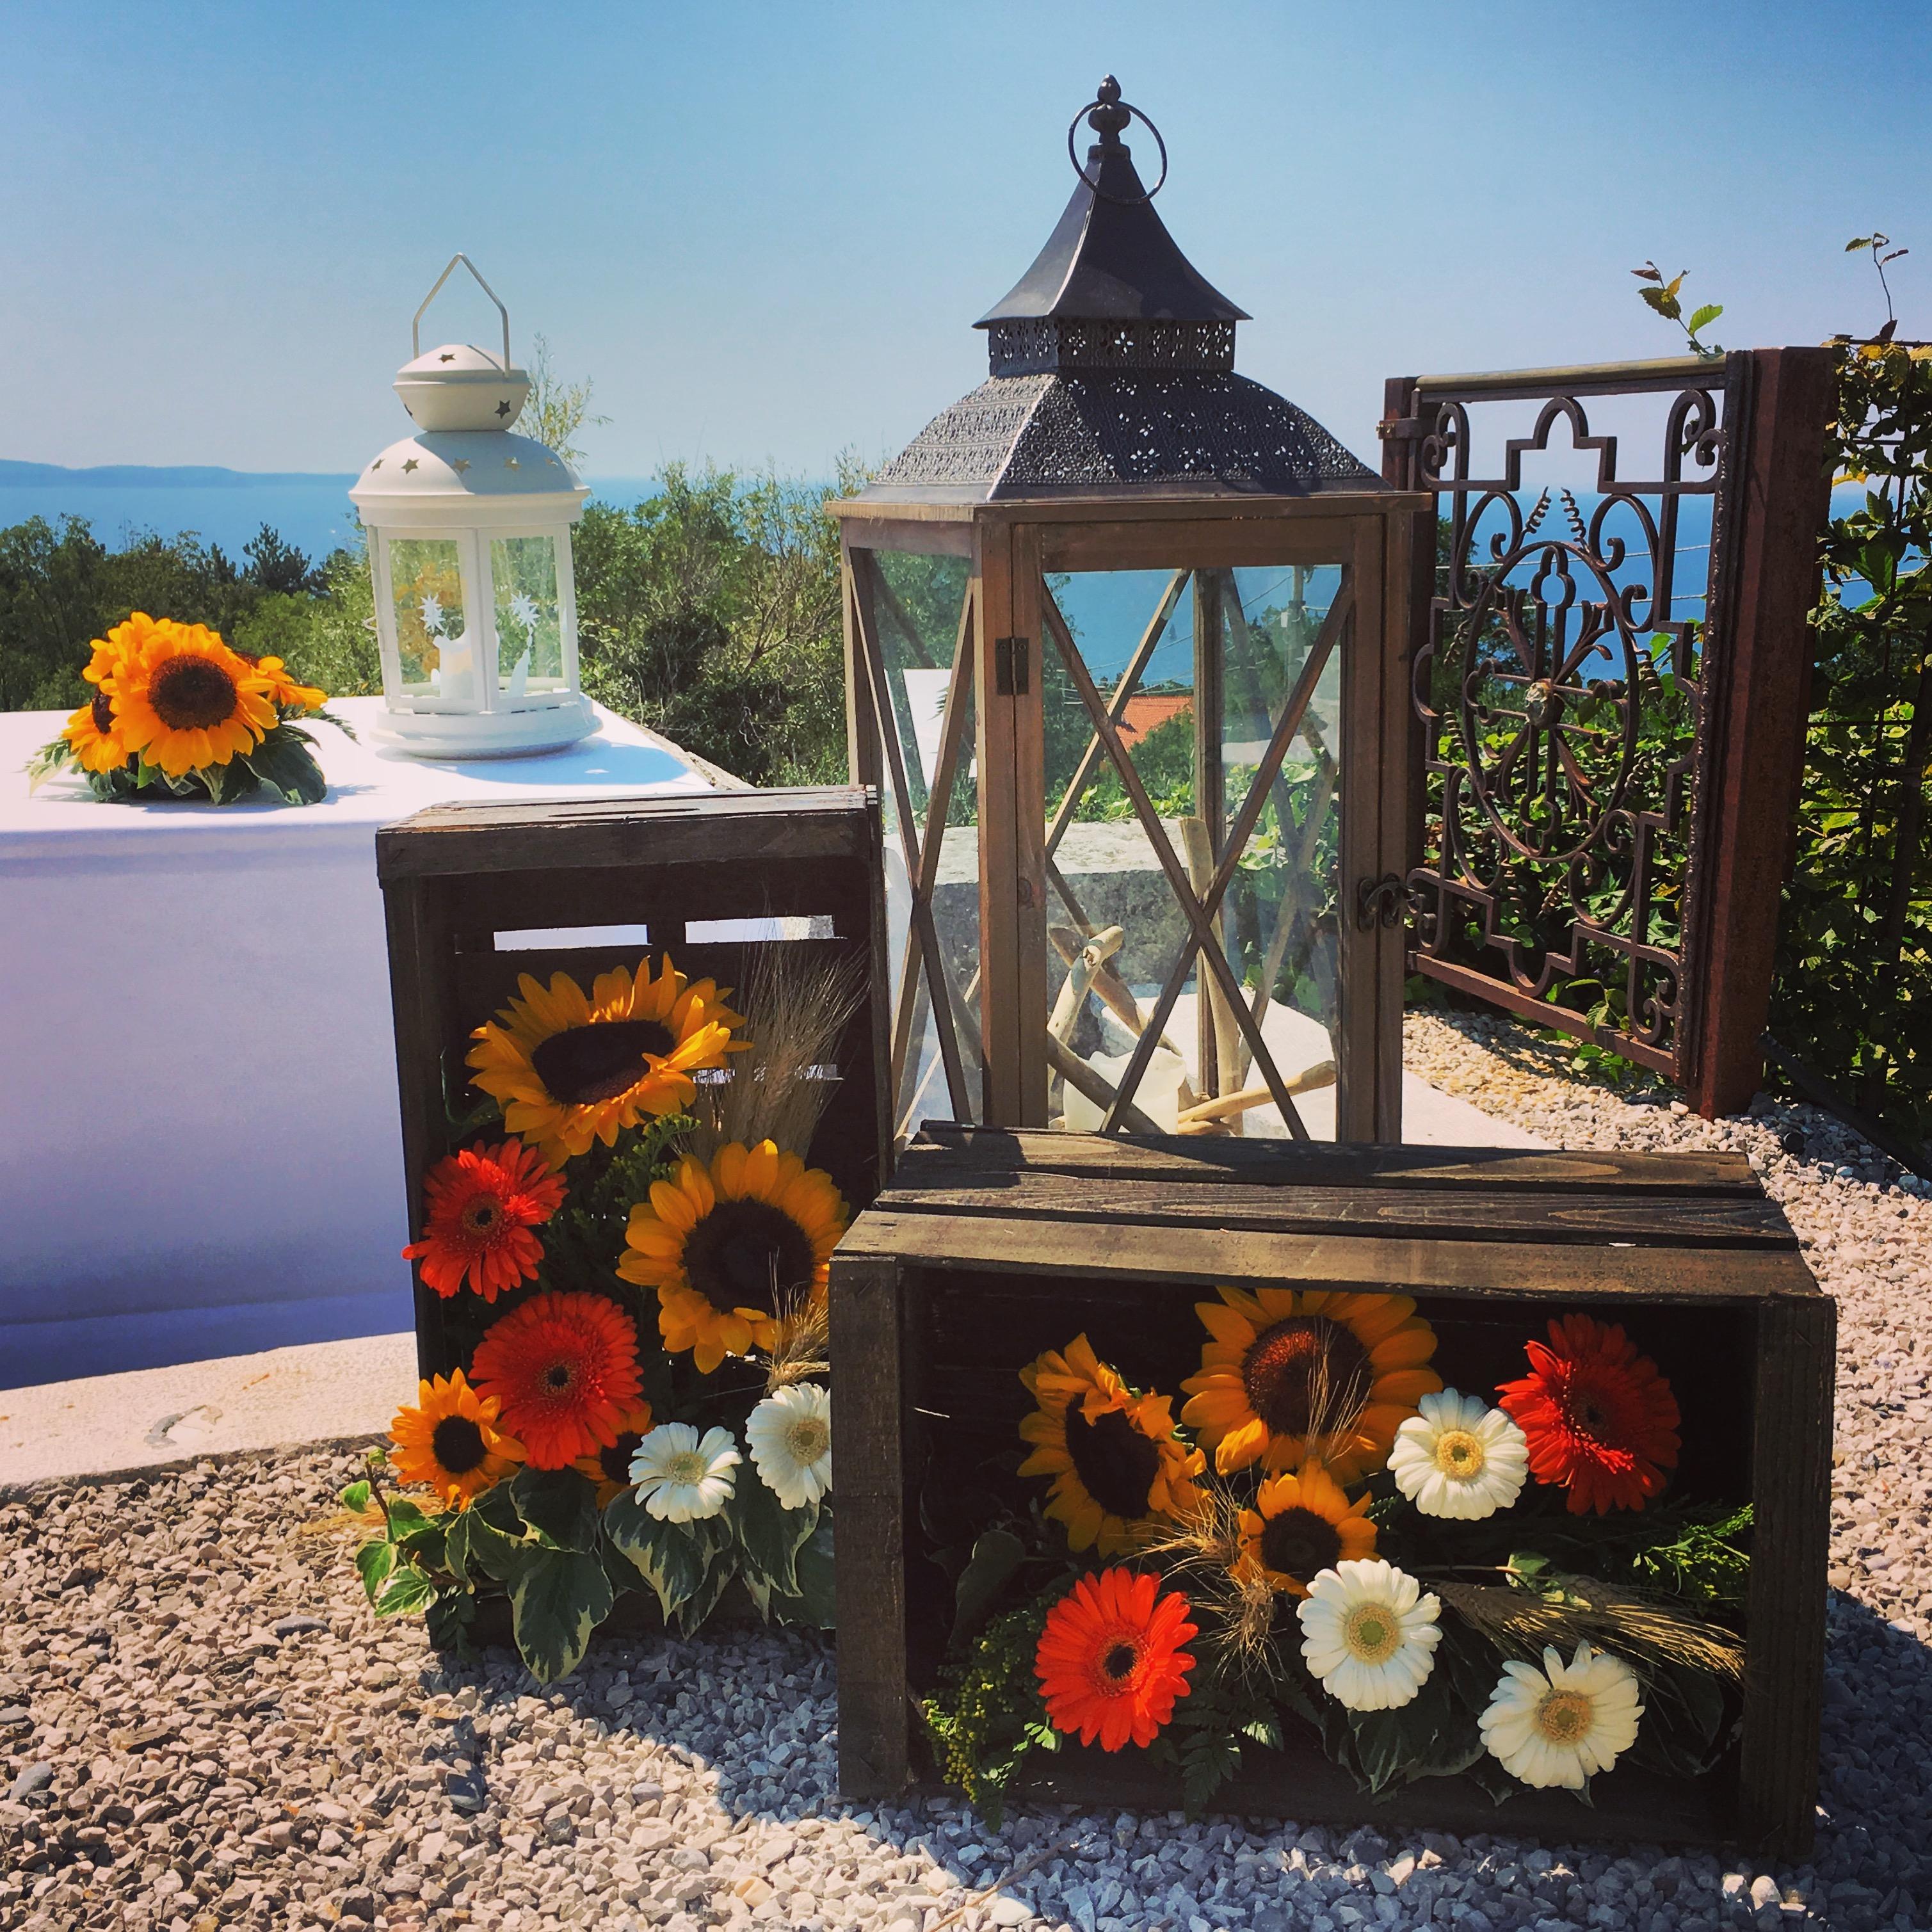 Villa_Bonomo_Matrimoni_Allestimenti_15